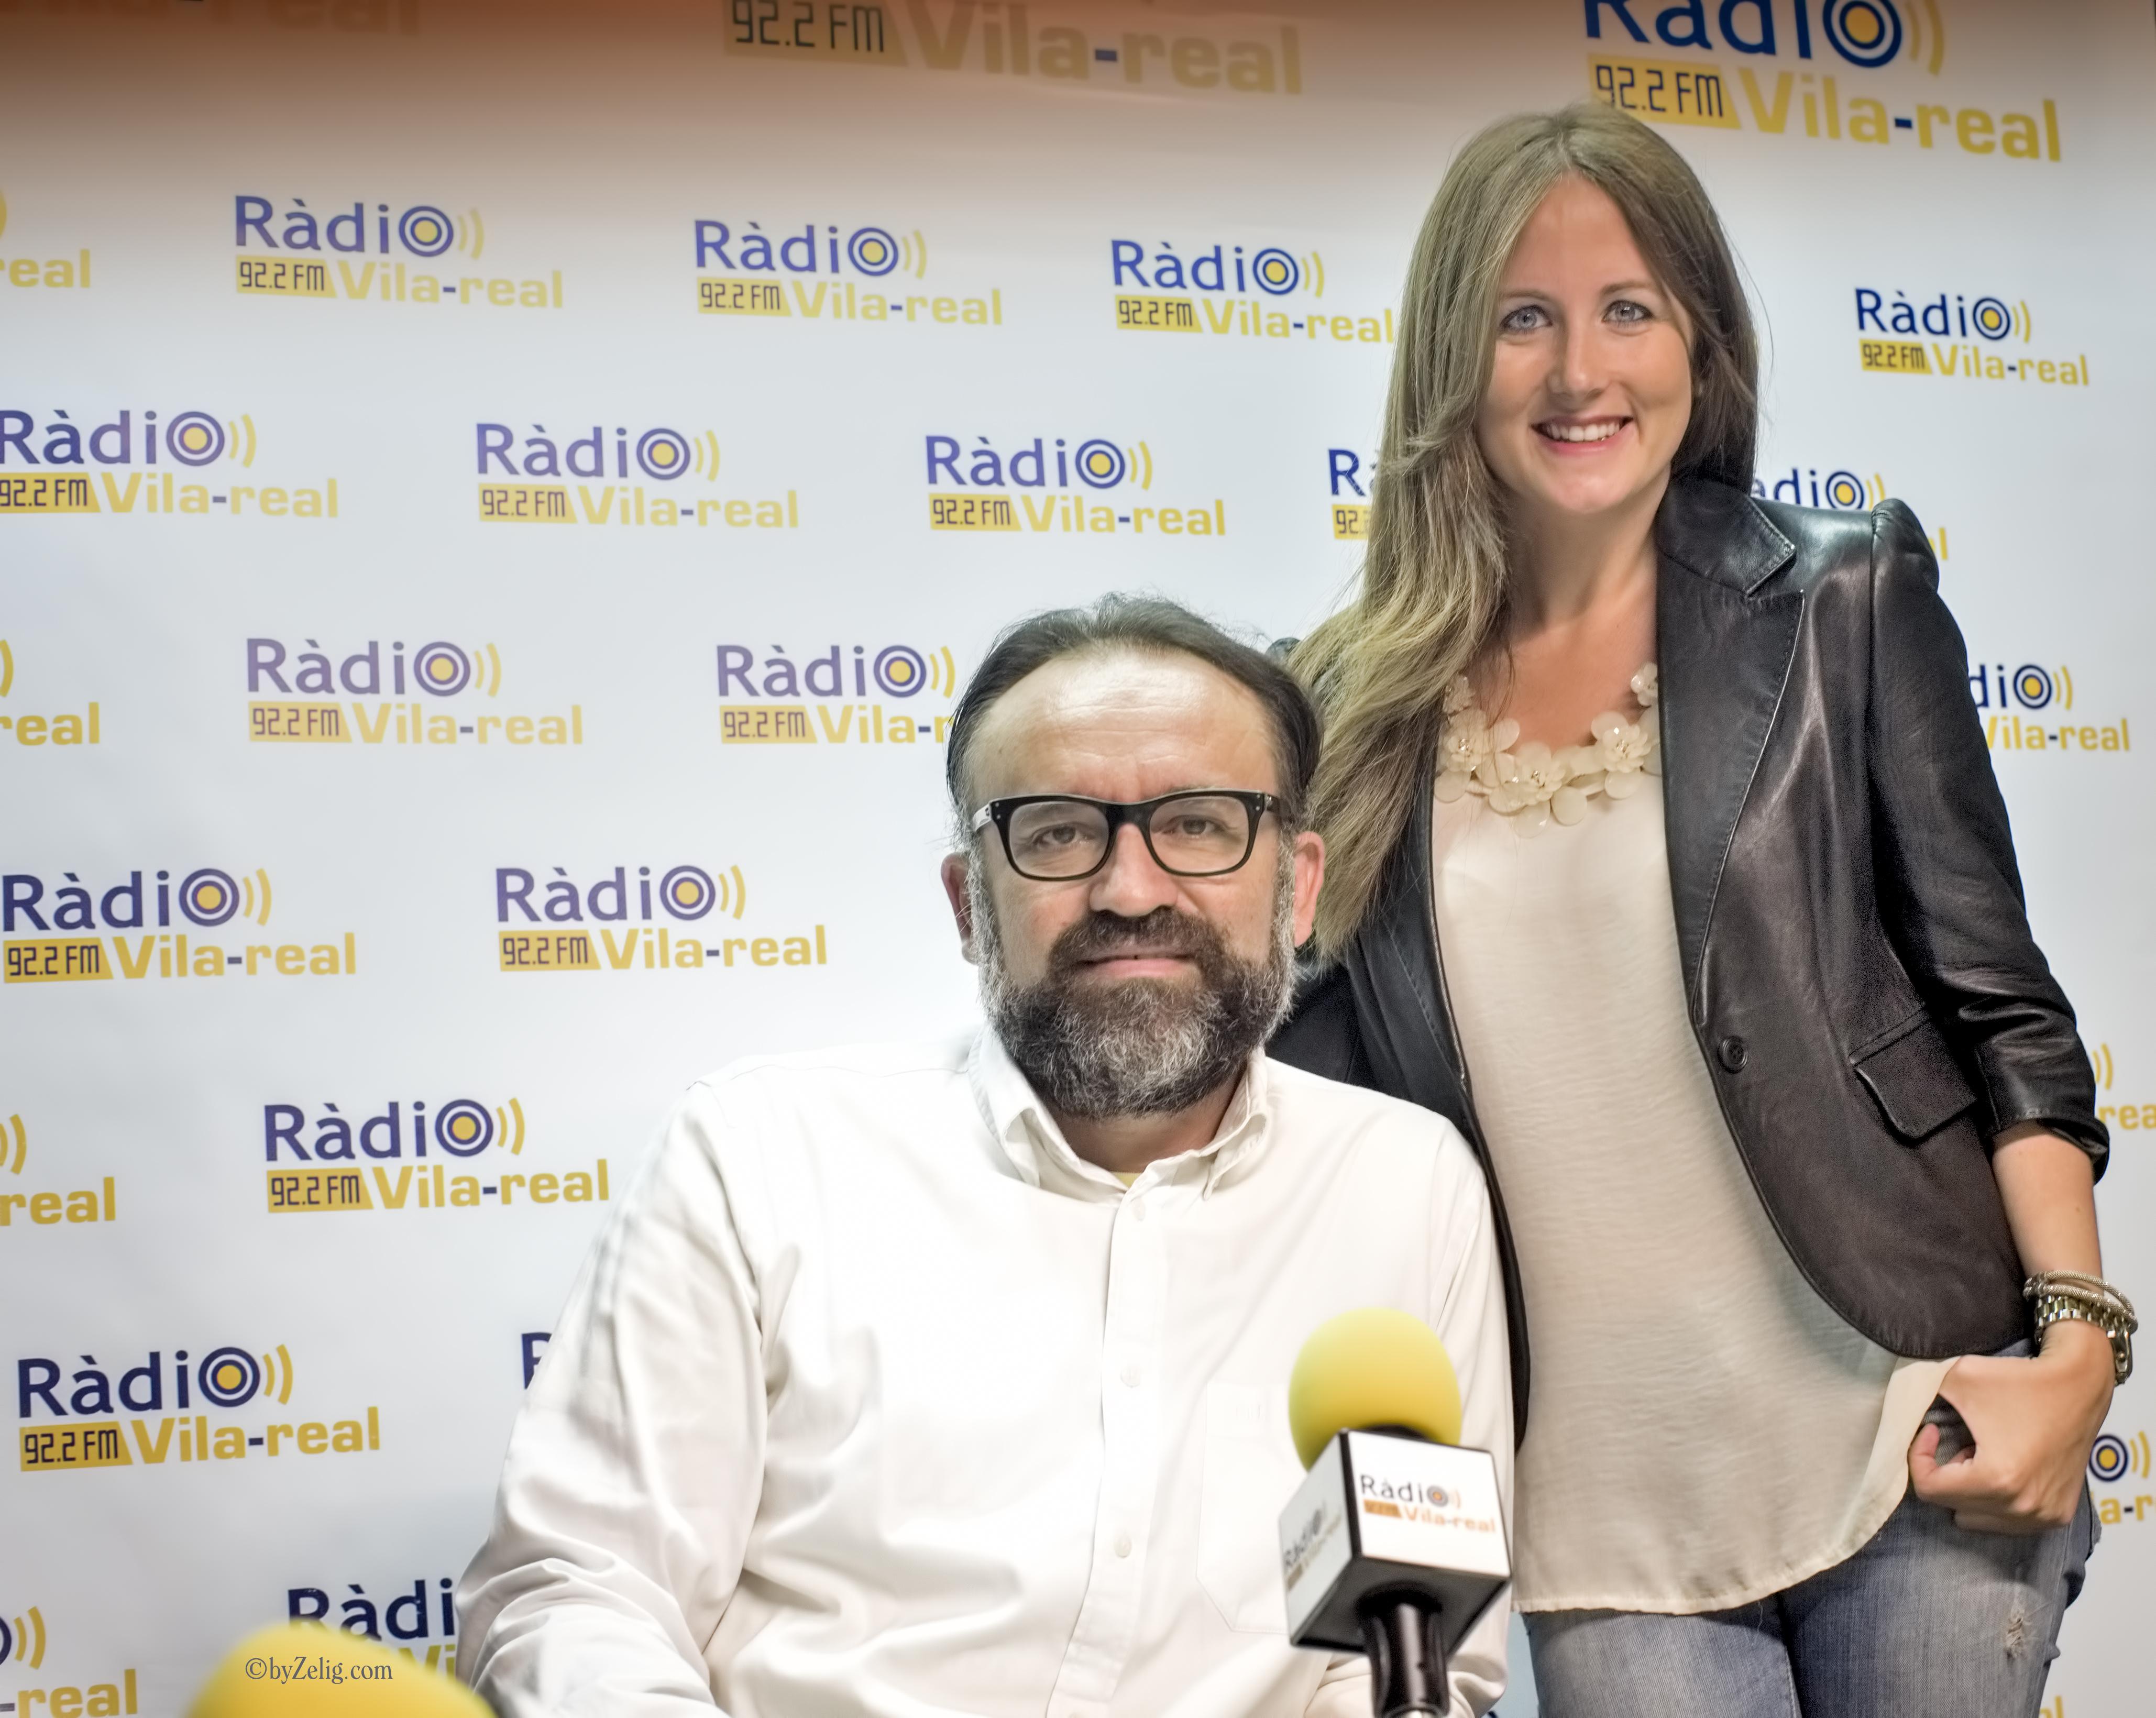 Esports Radio Vila-real. Programa del 27 de febrero de 2017